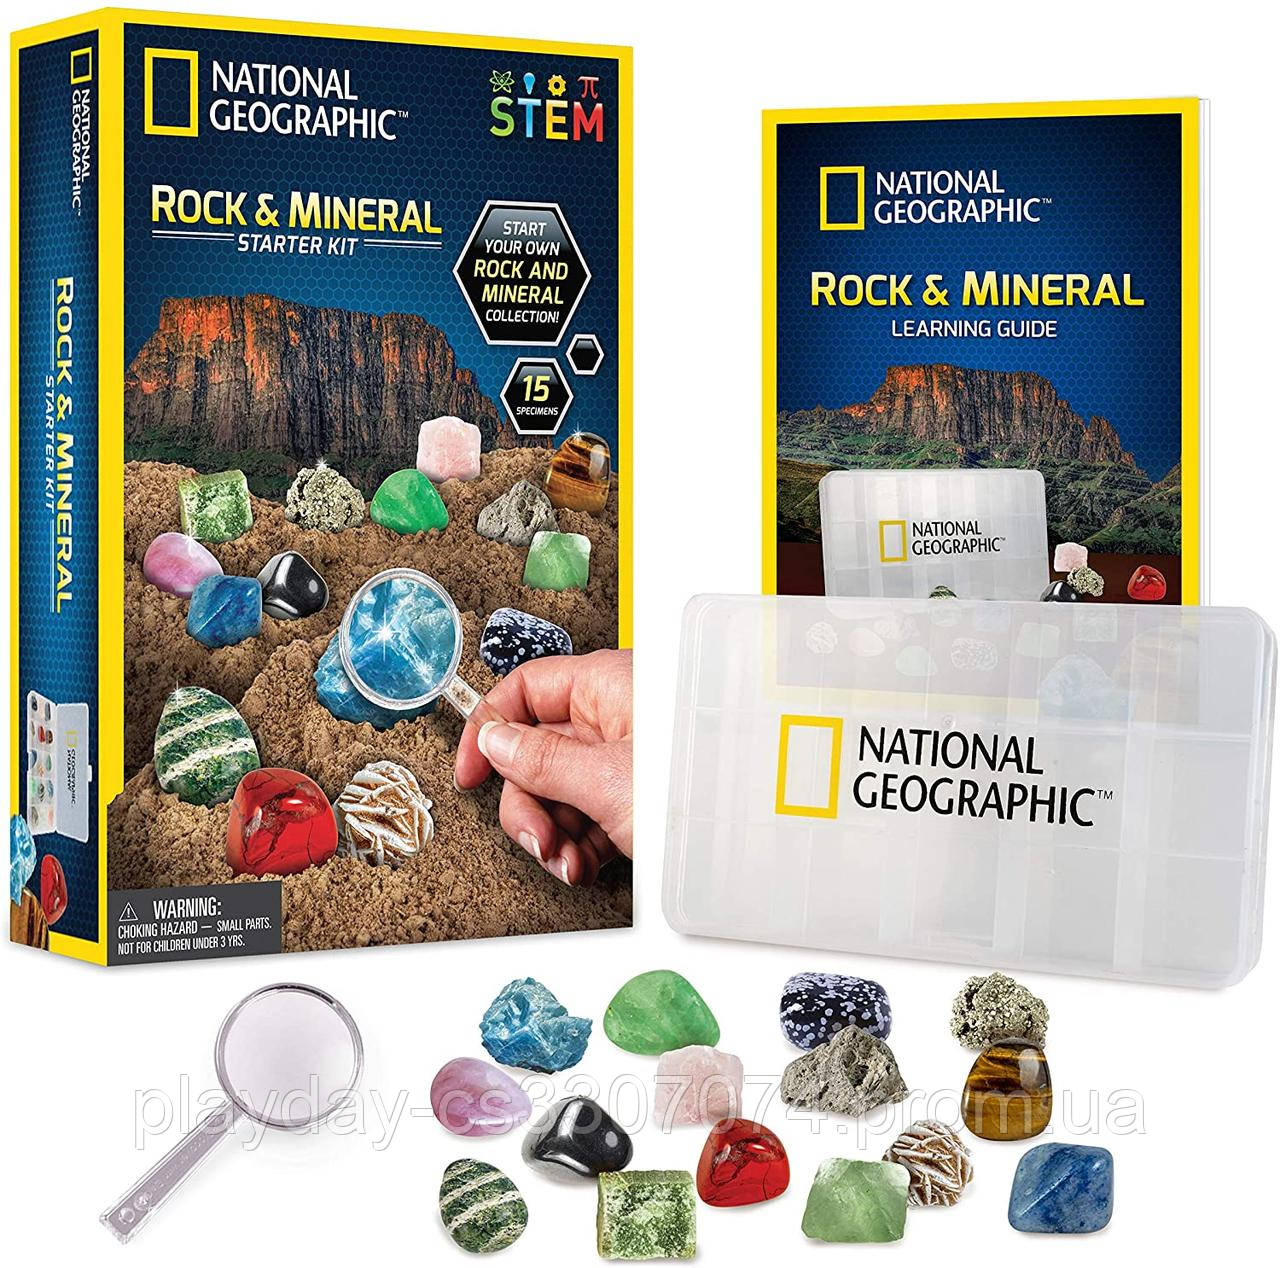 Набор камней и минералов National Geographic rock & mineral  starter kit